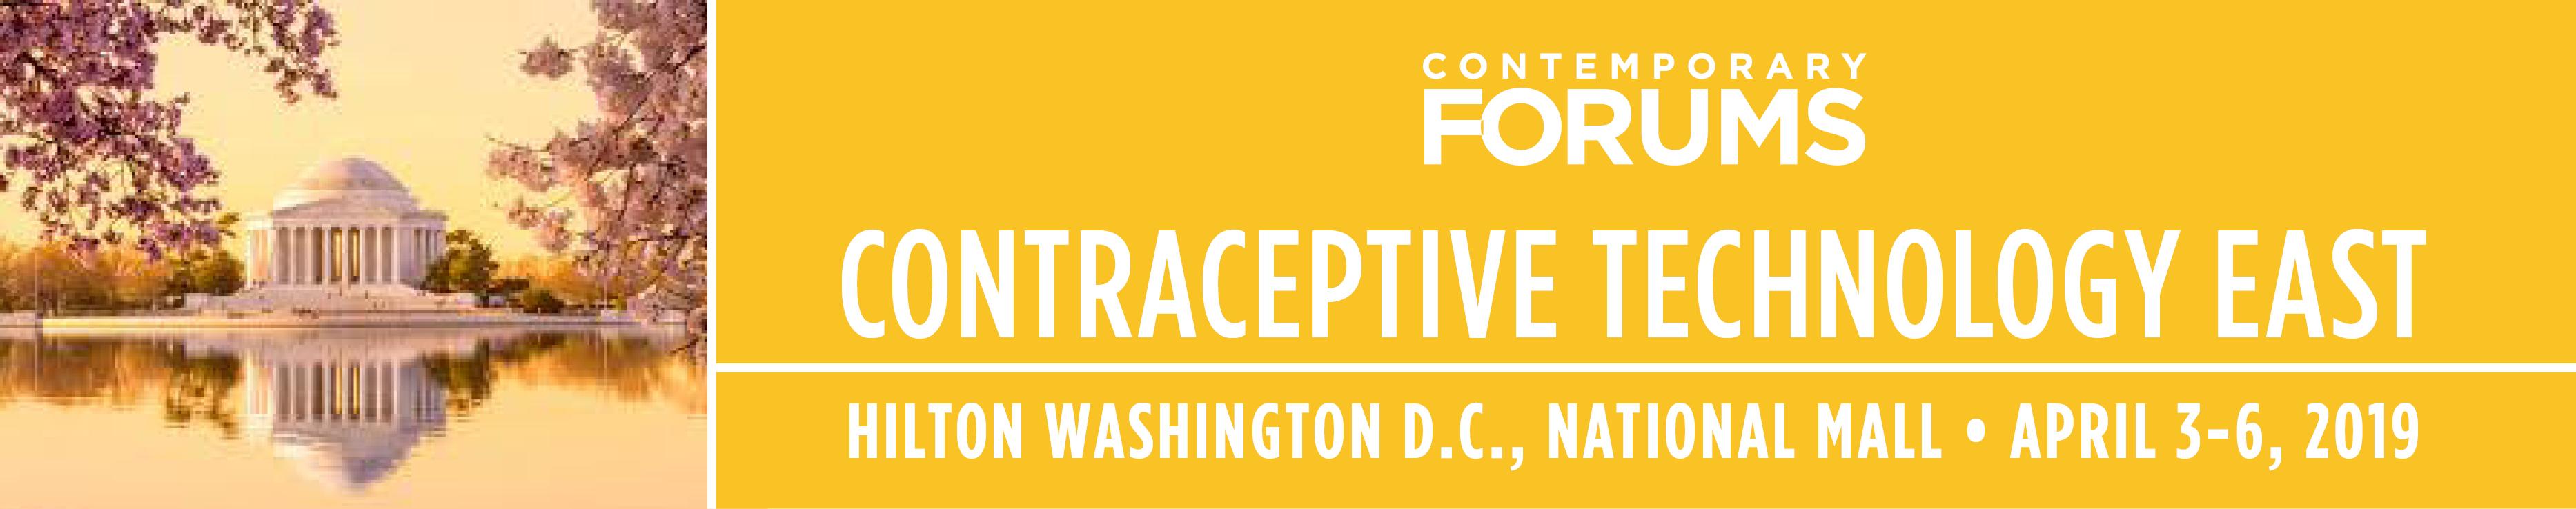 2019 Contraceptive Technology - East (April 3-6, 2019)